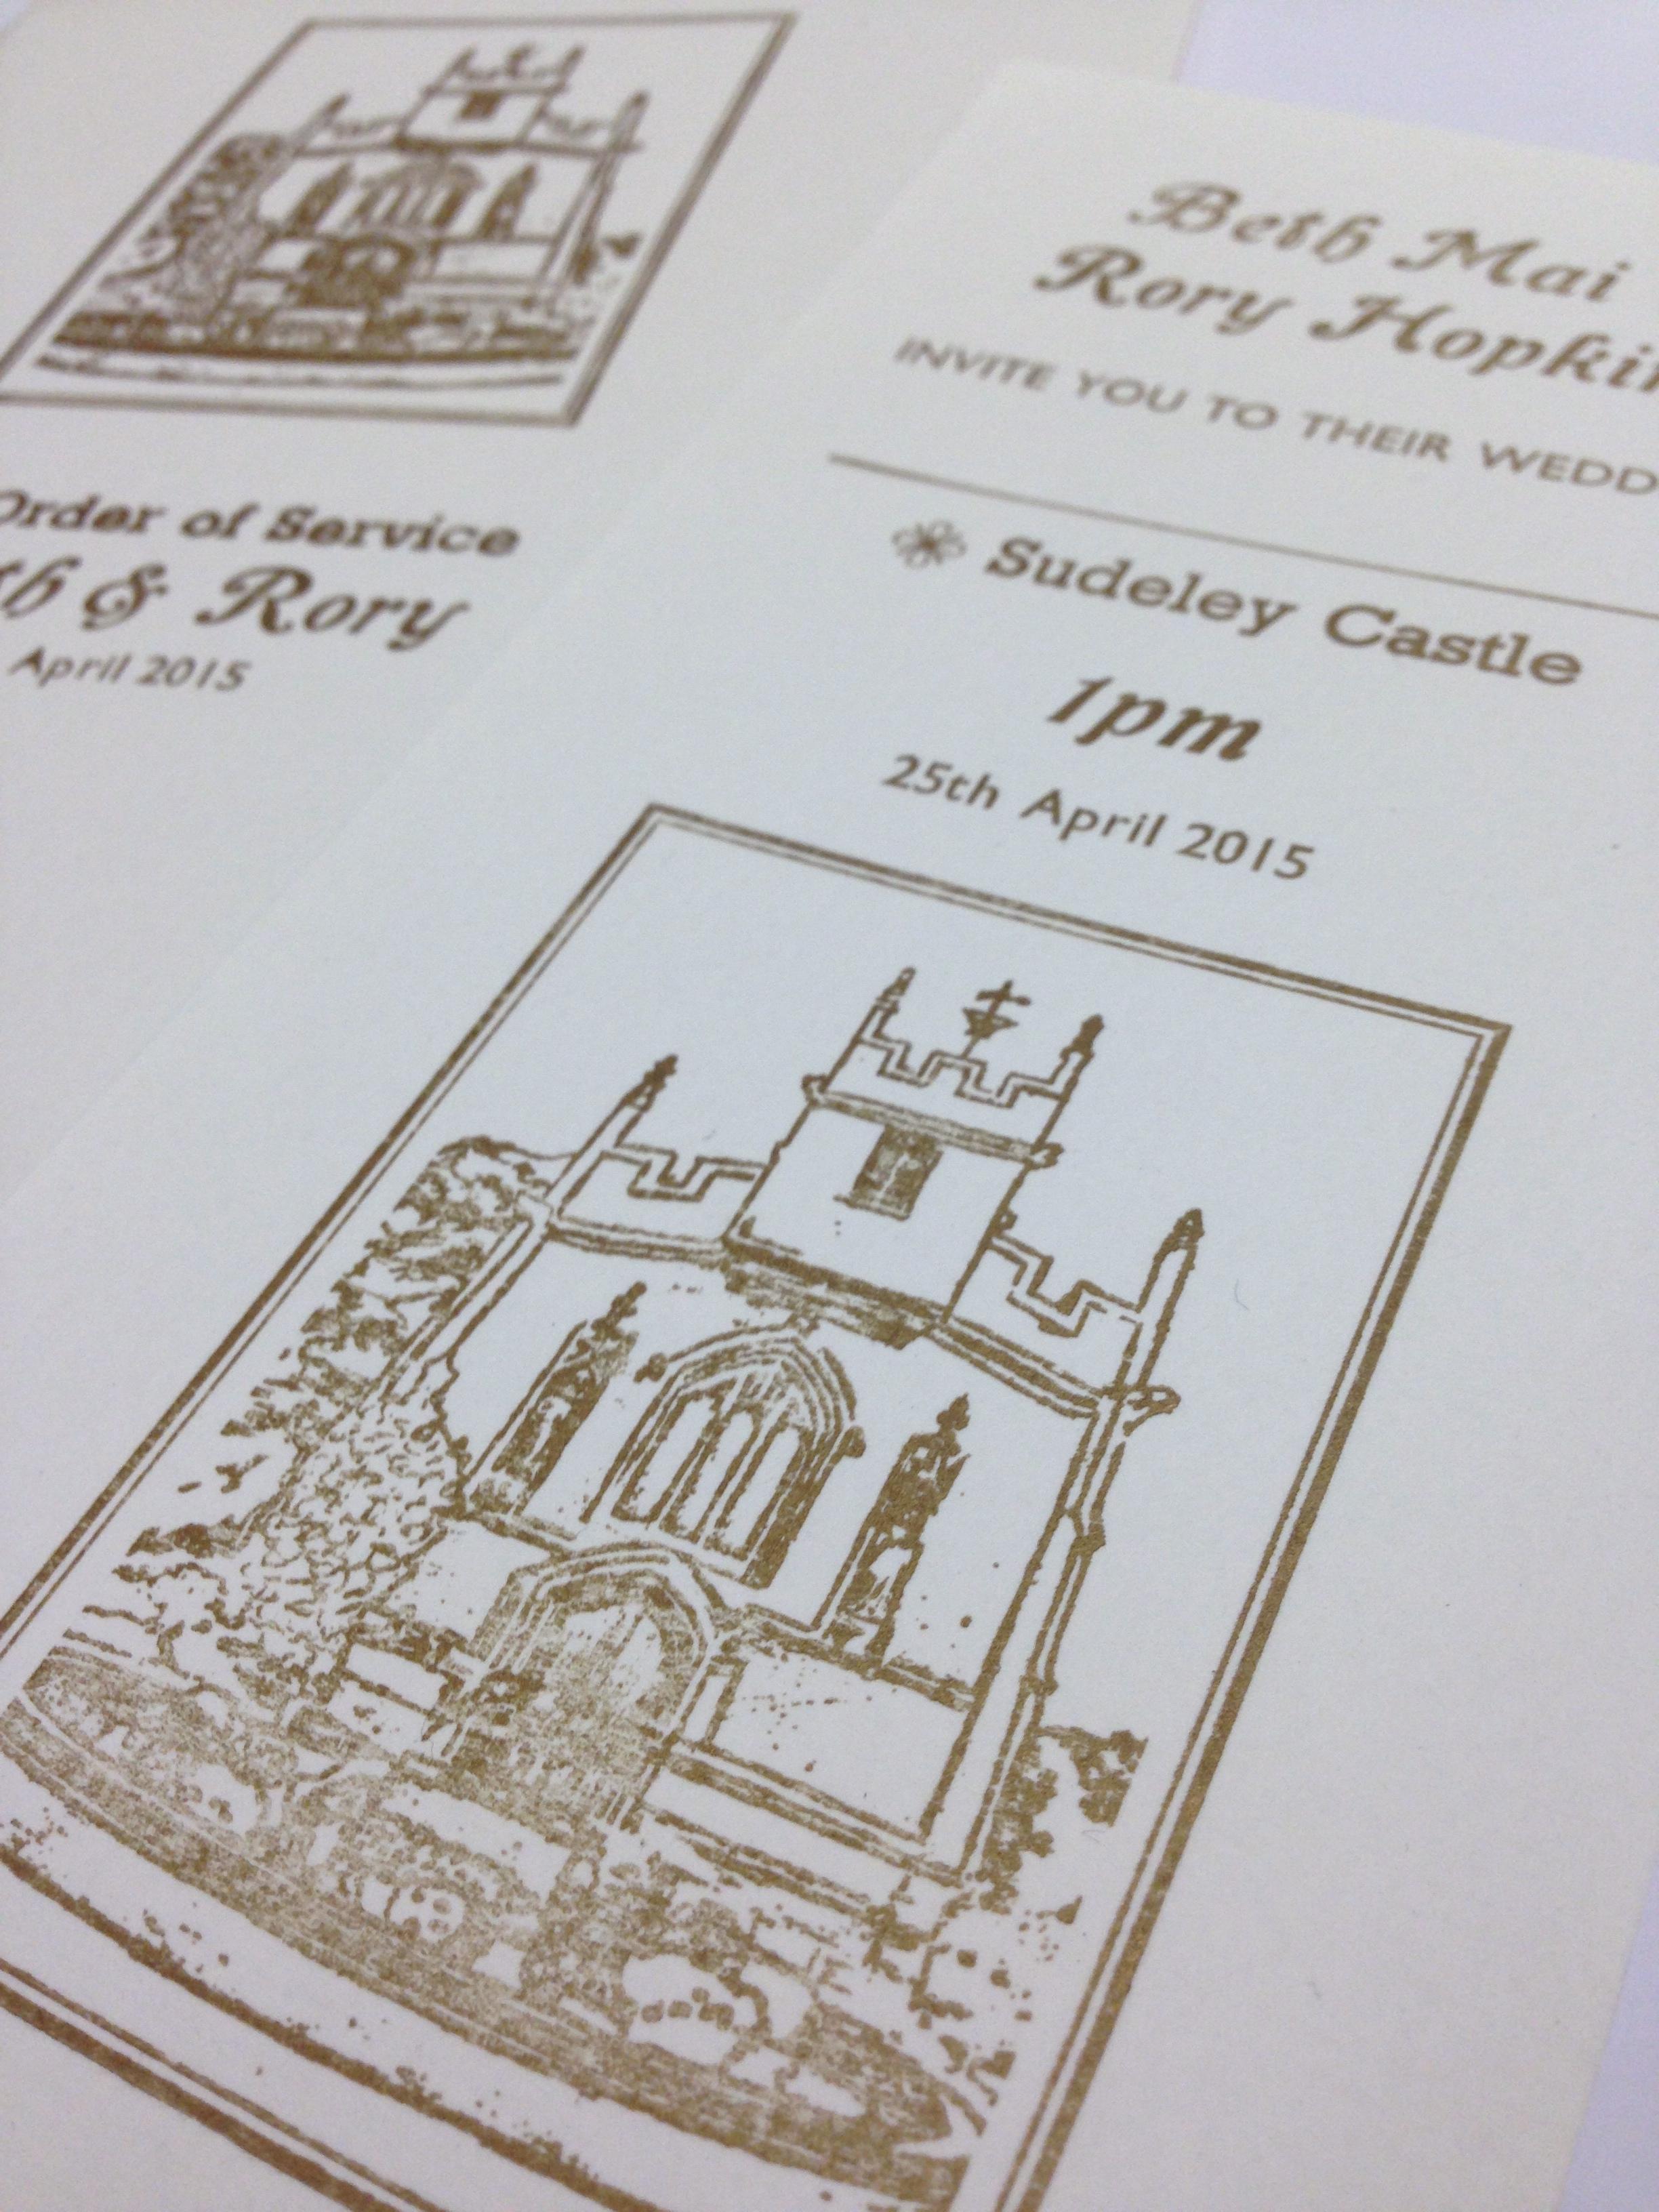 sudeley castle wedding invitations